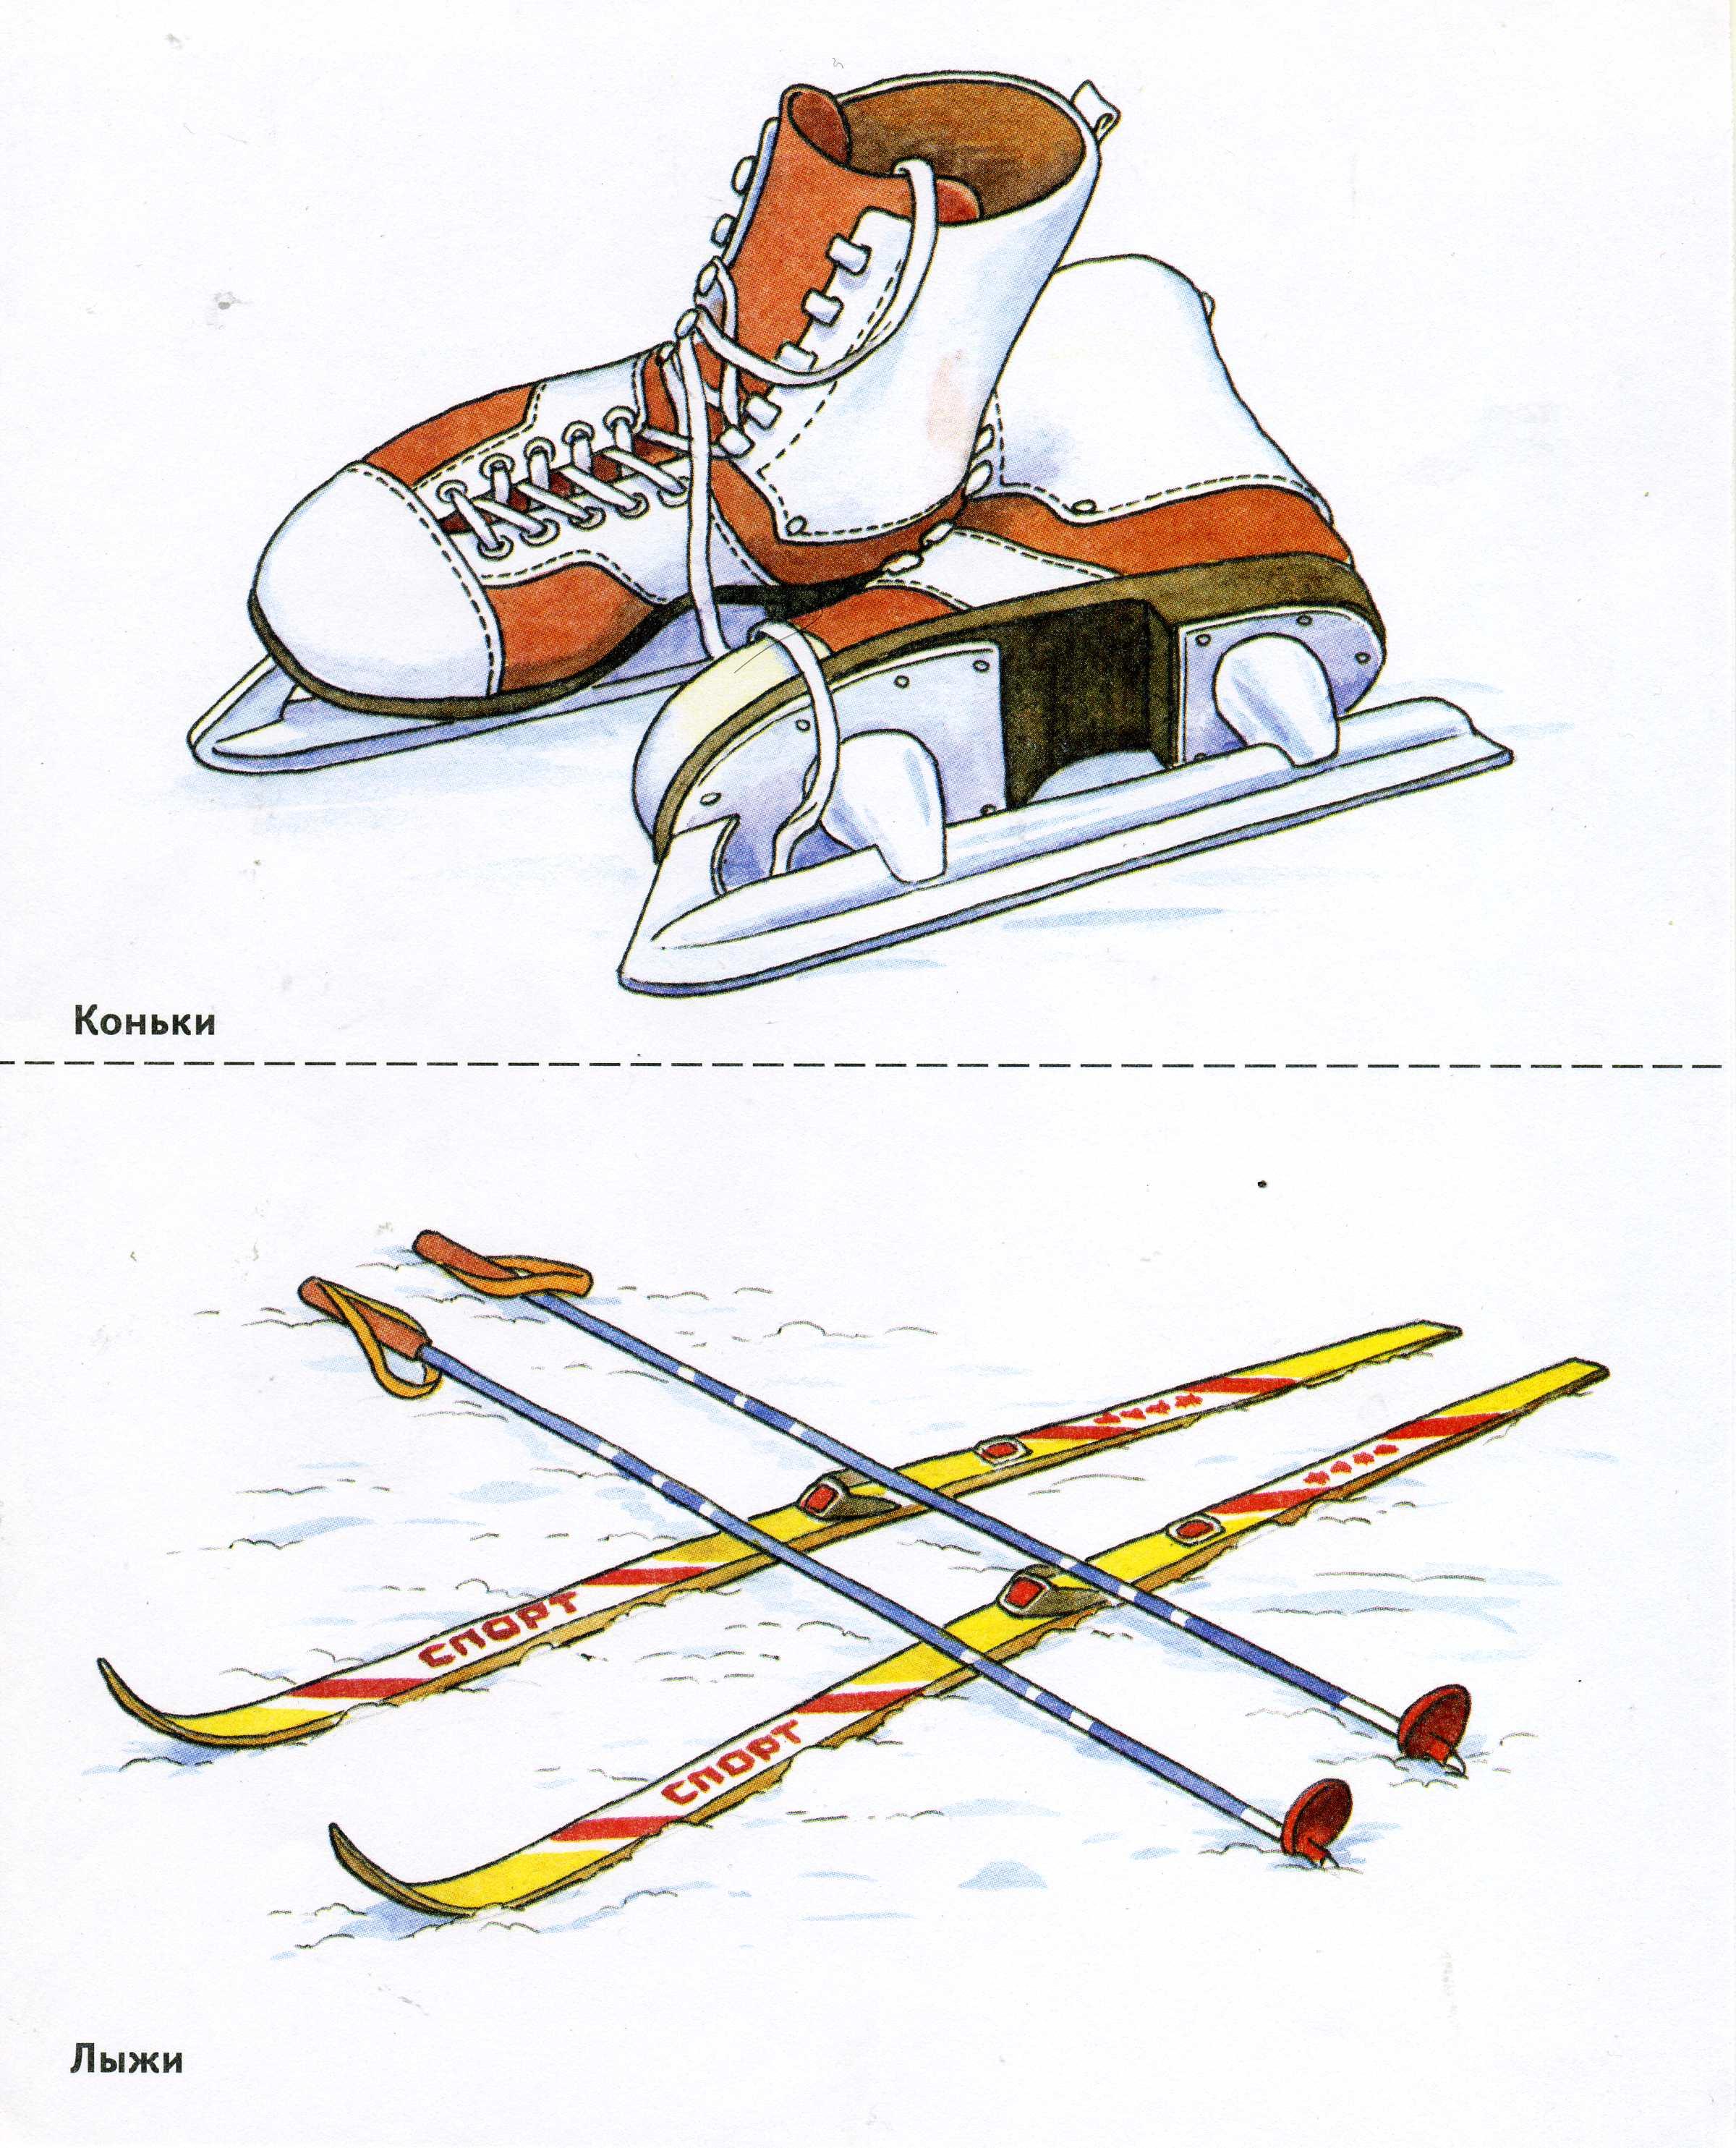 рисунок лыжи и санки